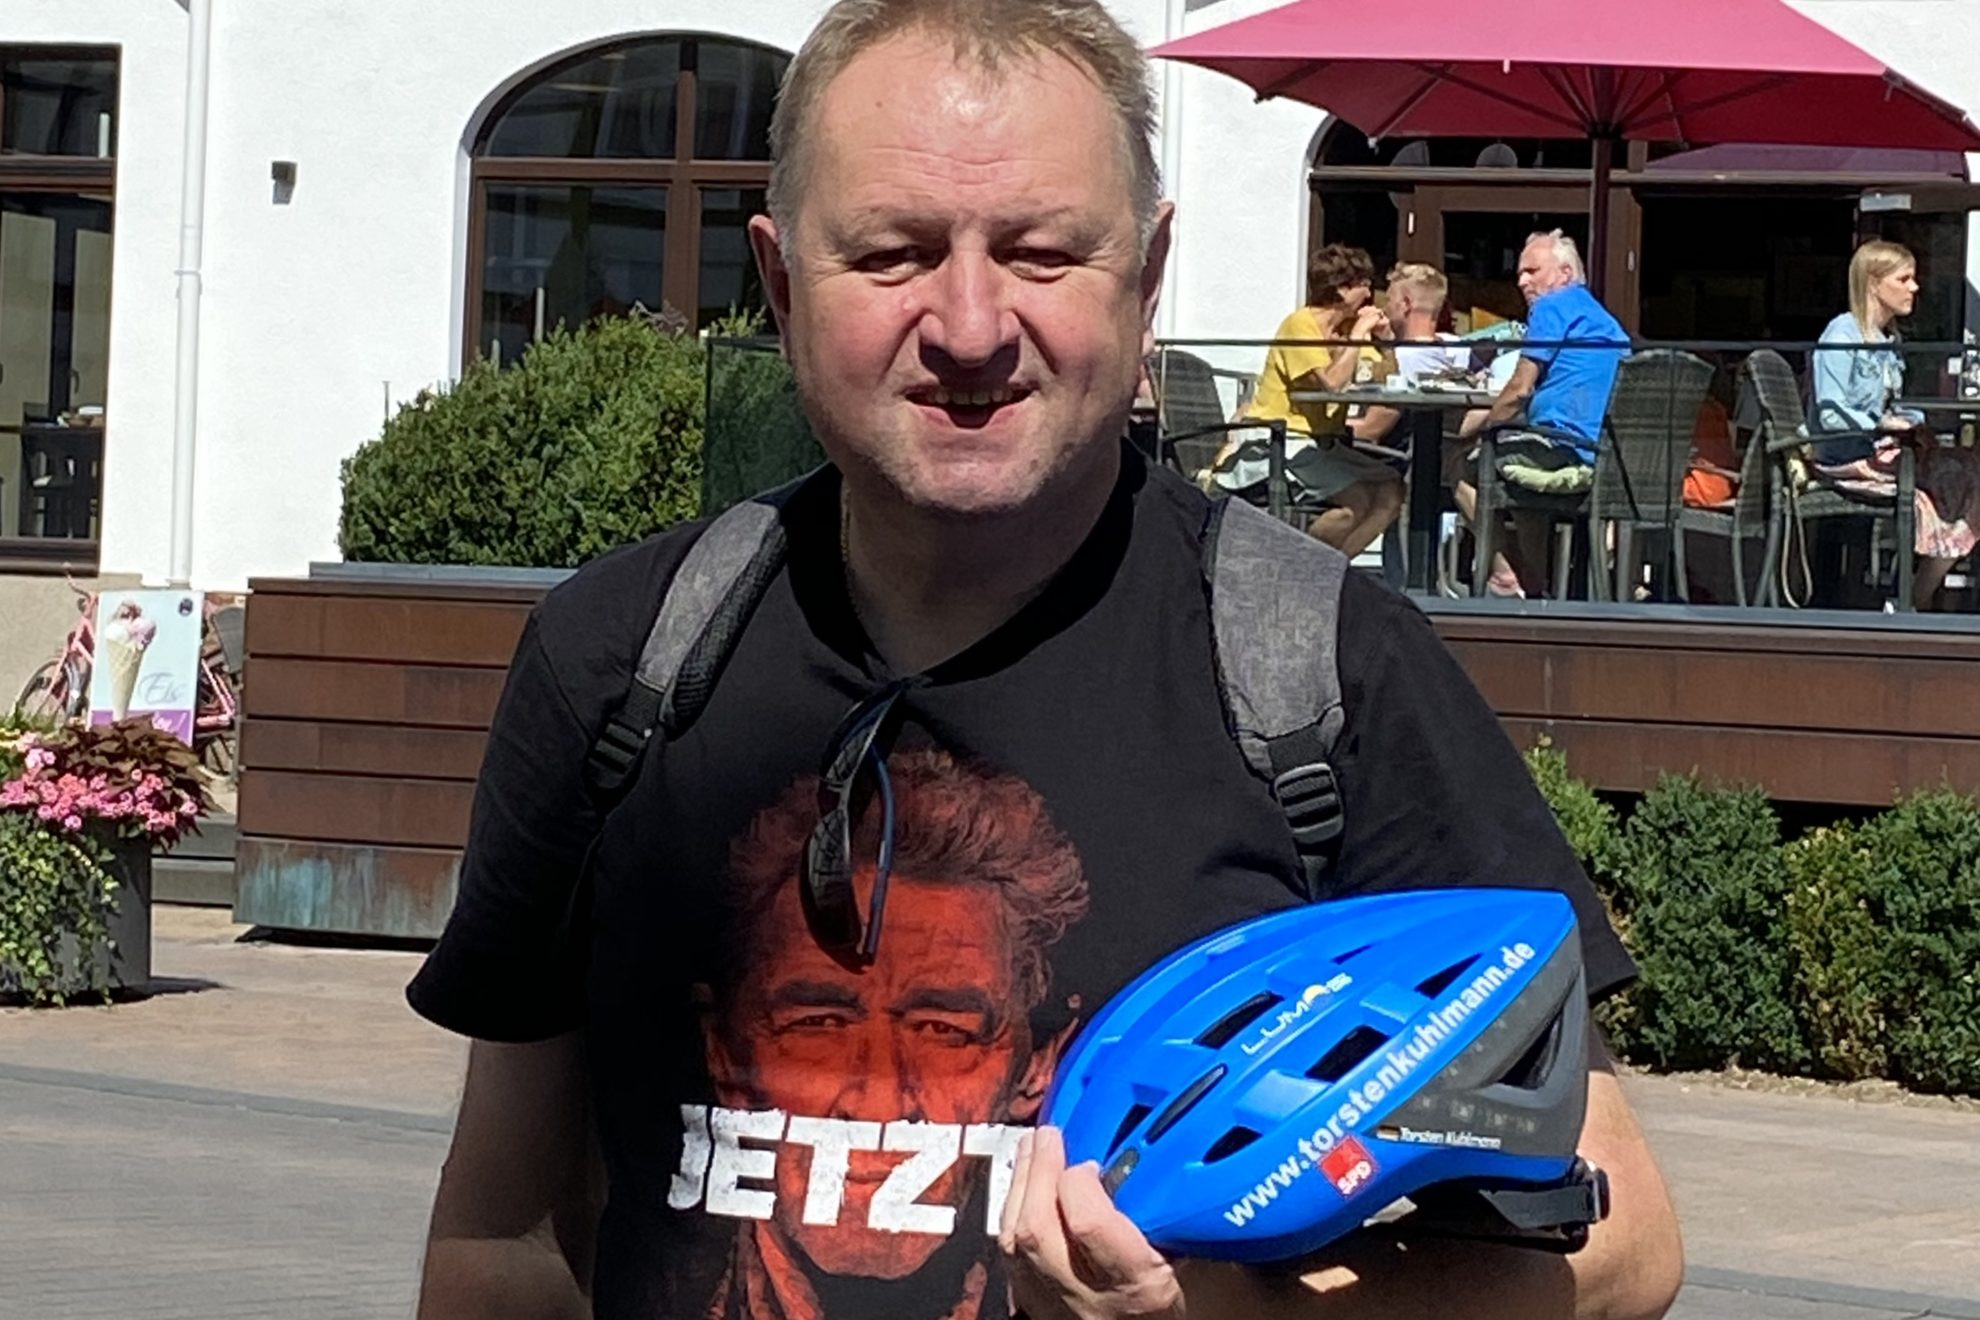 Radfahrer Kuhlmann